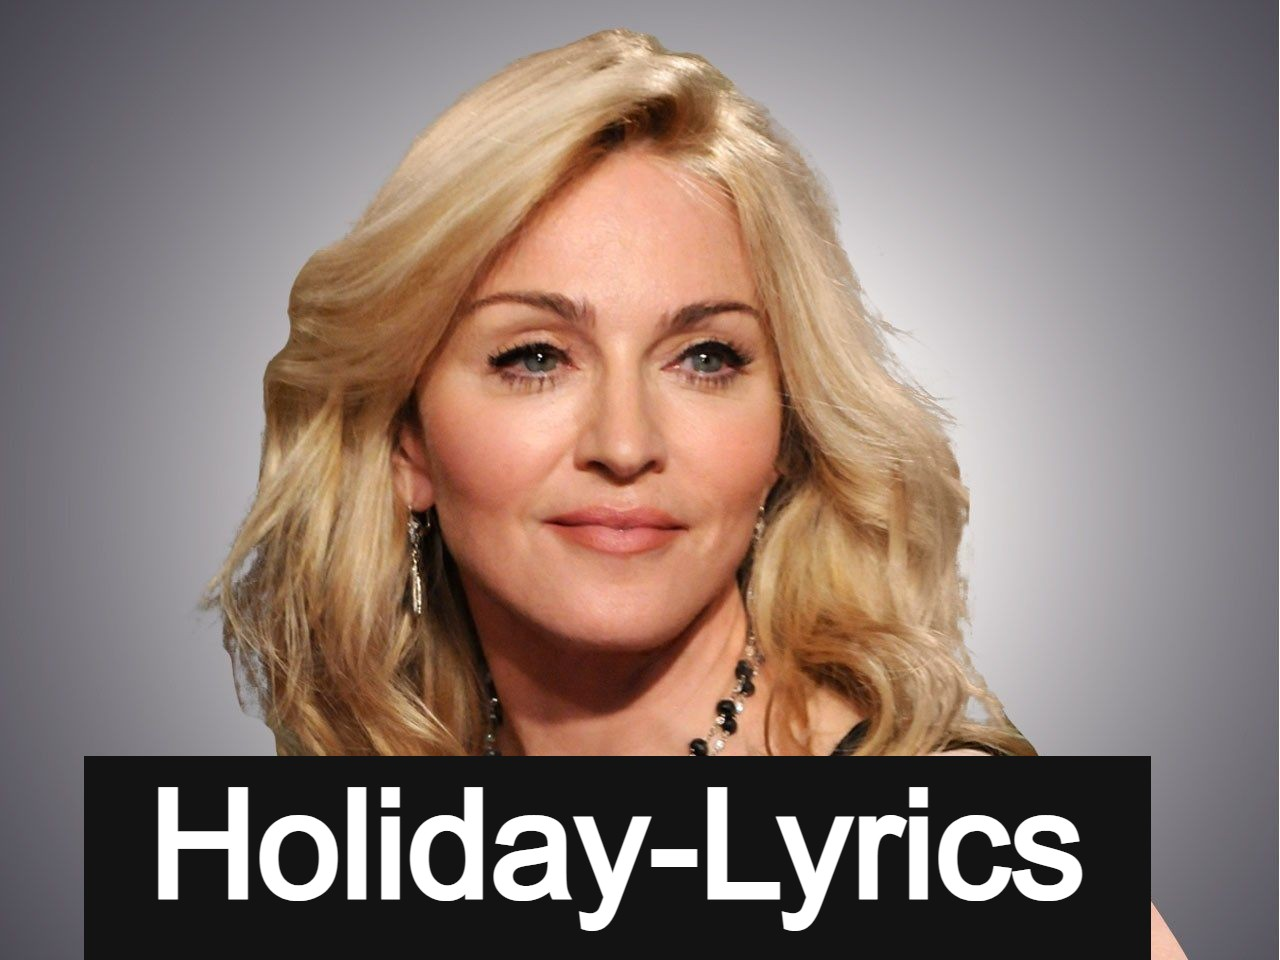 Holiday Song Lyrics By Madonna